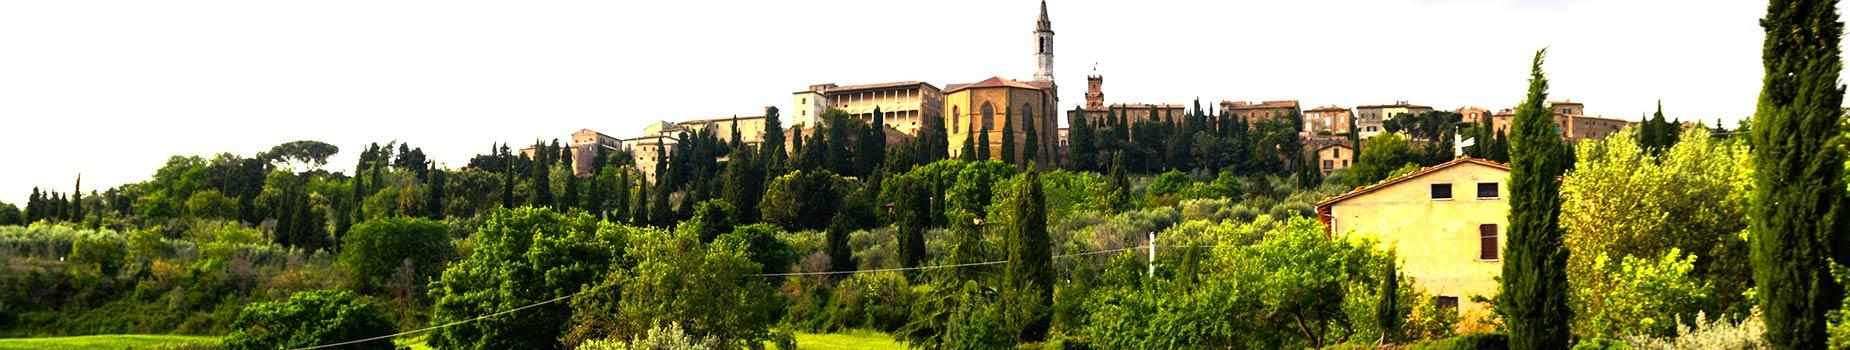 Busrondreis Toscane